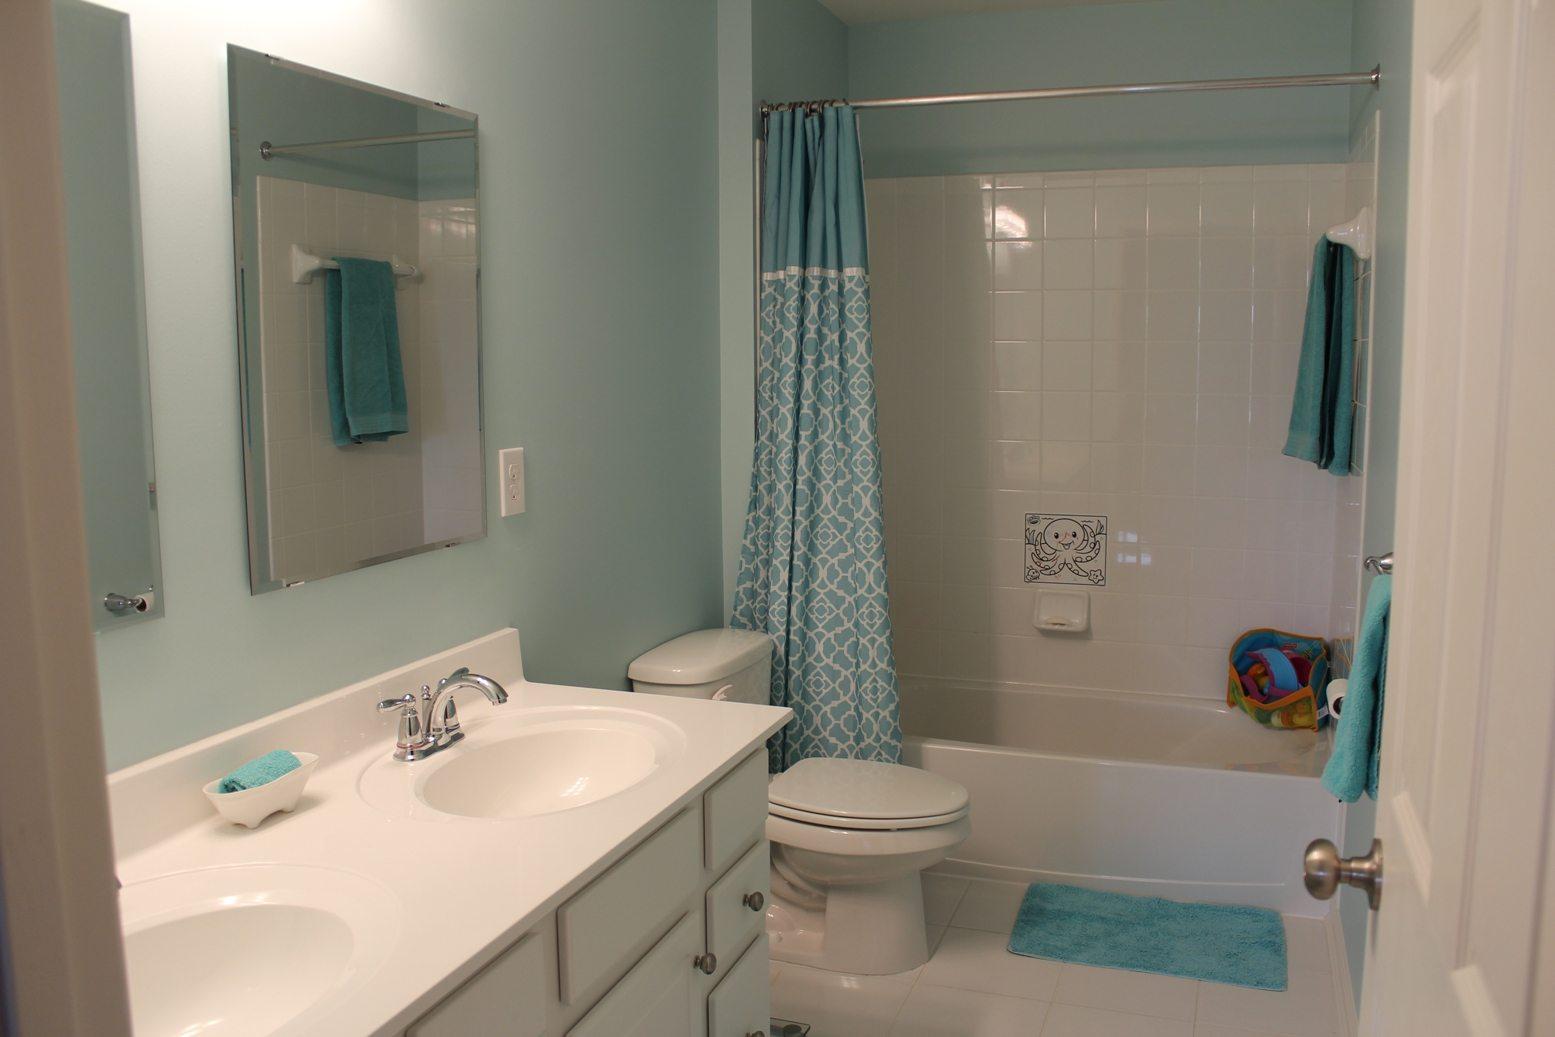 Покраска ванной комнаты своими руками фото 182